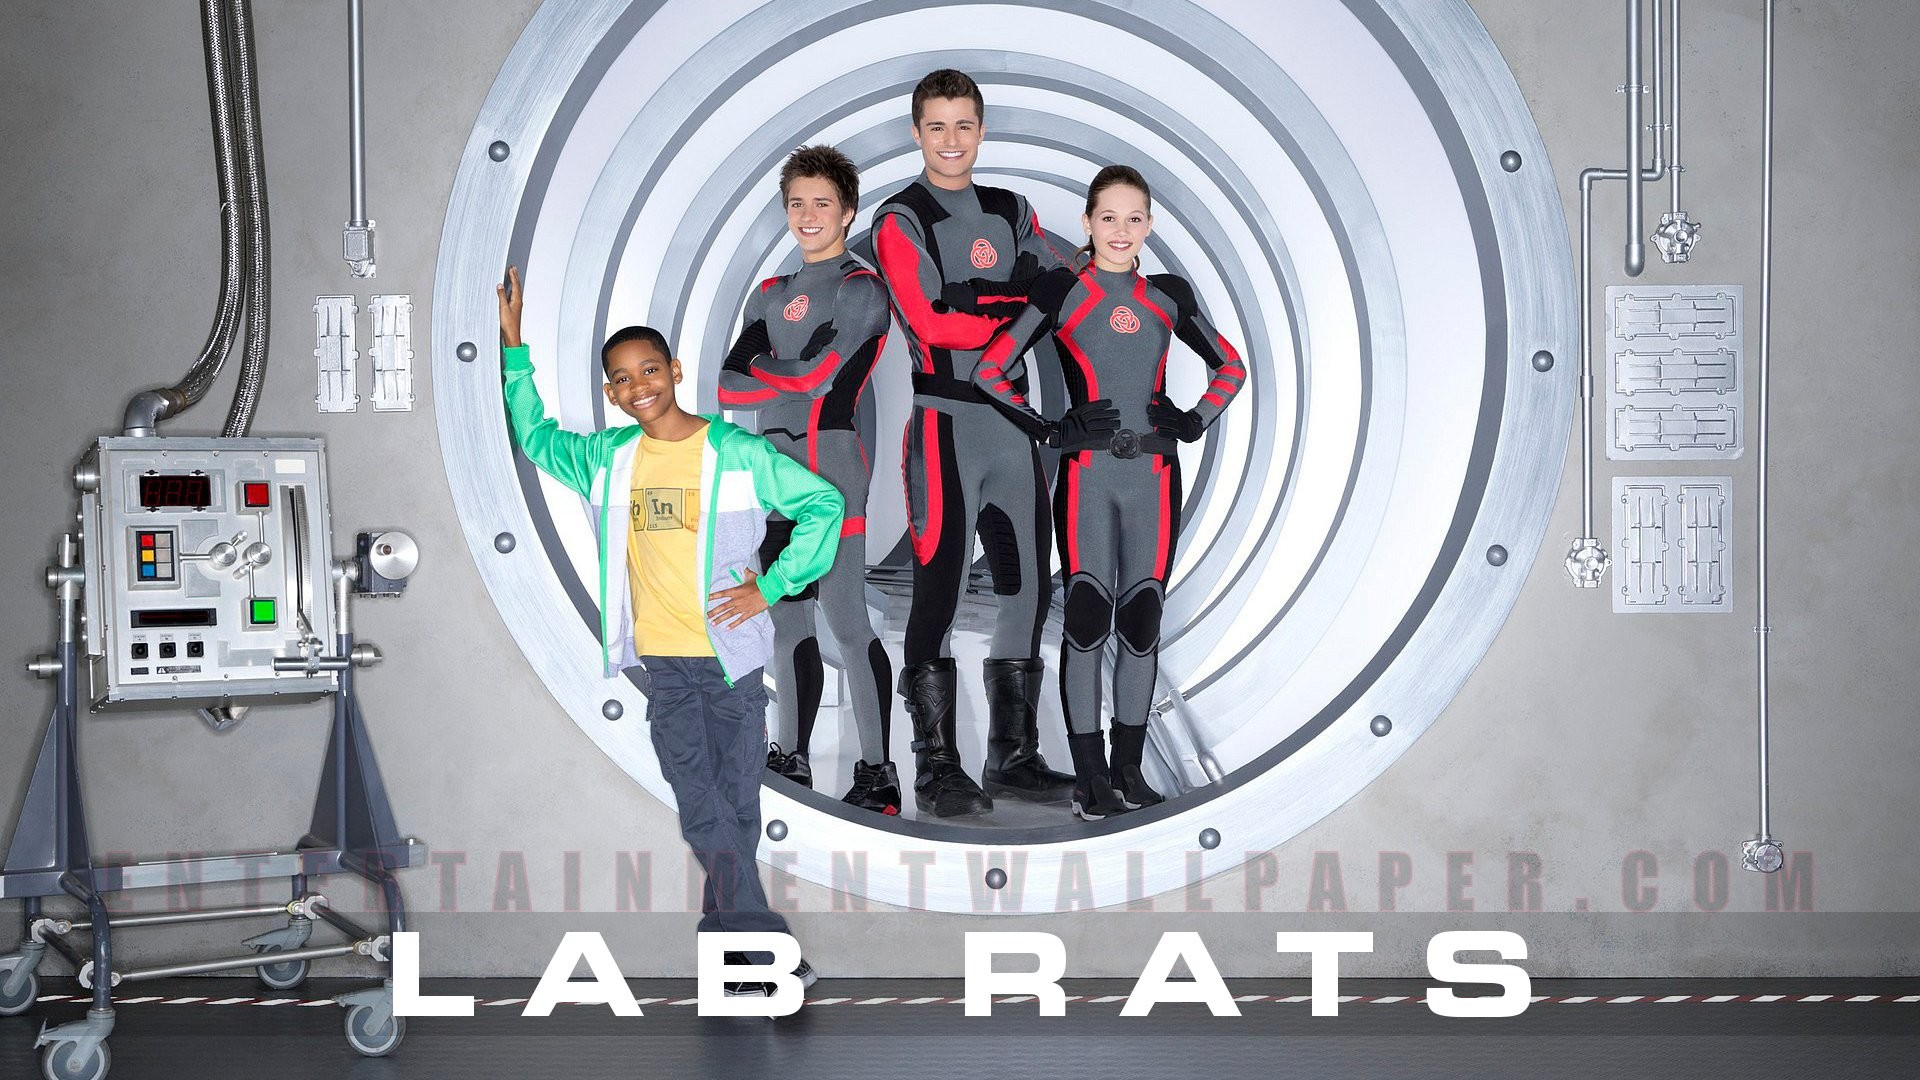 Lab Rats – Disney XD's Lab Rats Wallpaper (37975393) – Fanpop